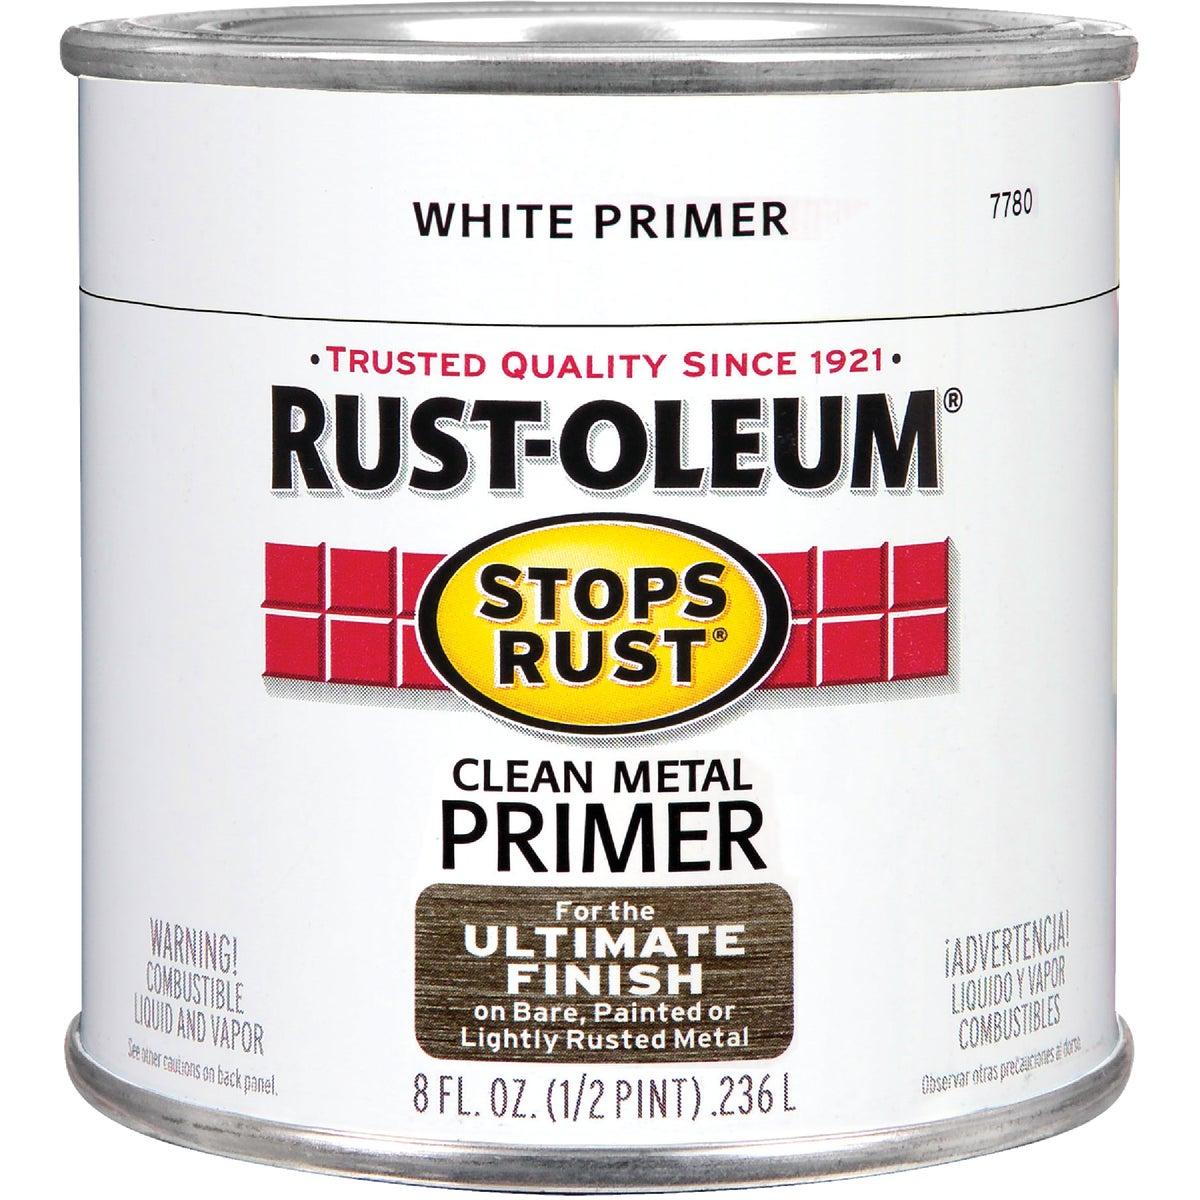 WHITE CLEAN METAL PRIMER - 7780-730 by Rustoleum